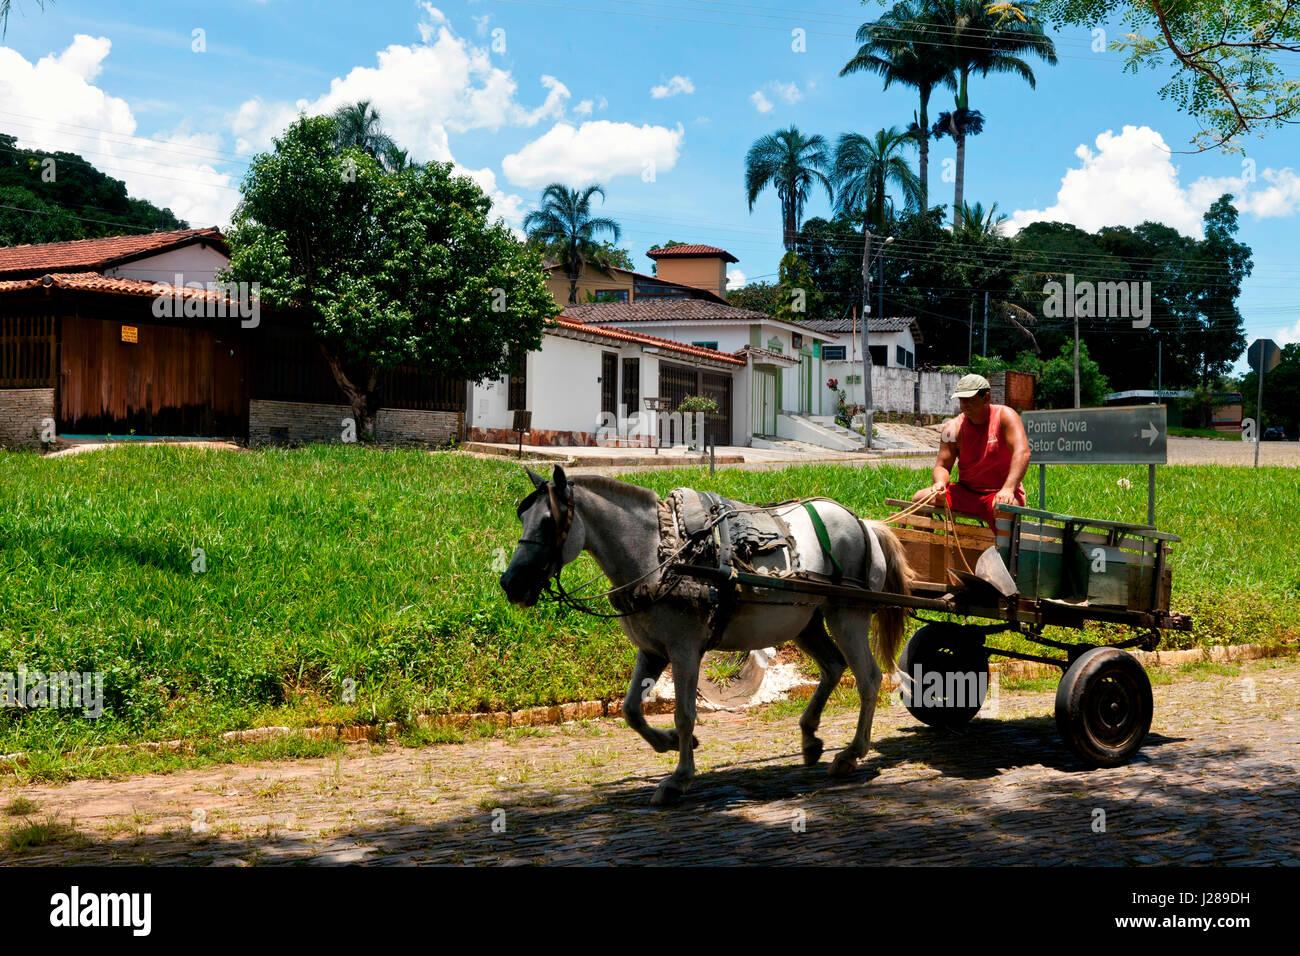 Brazil, state of Goias, Pirenopolis, horse-driven cart - Stock Image